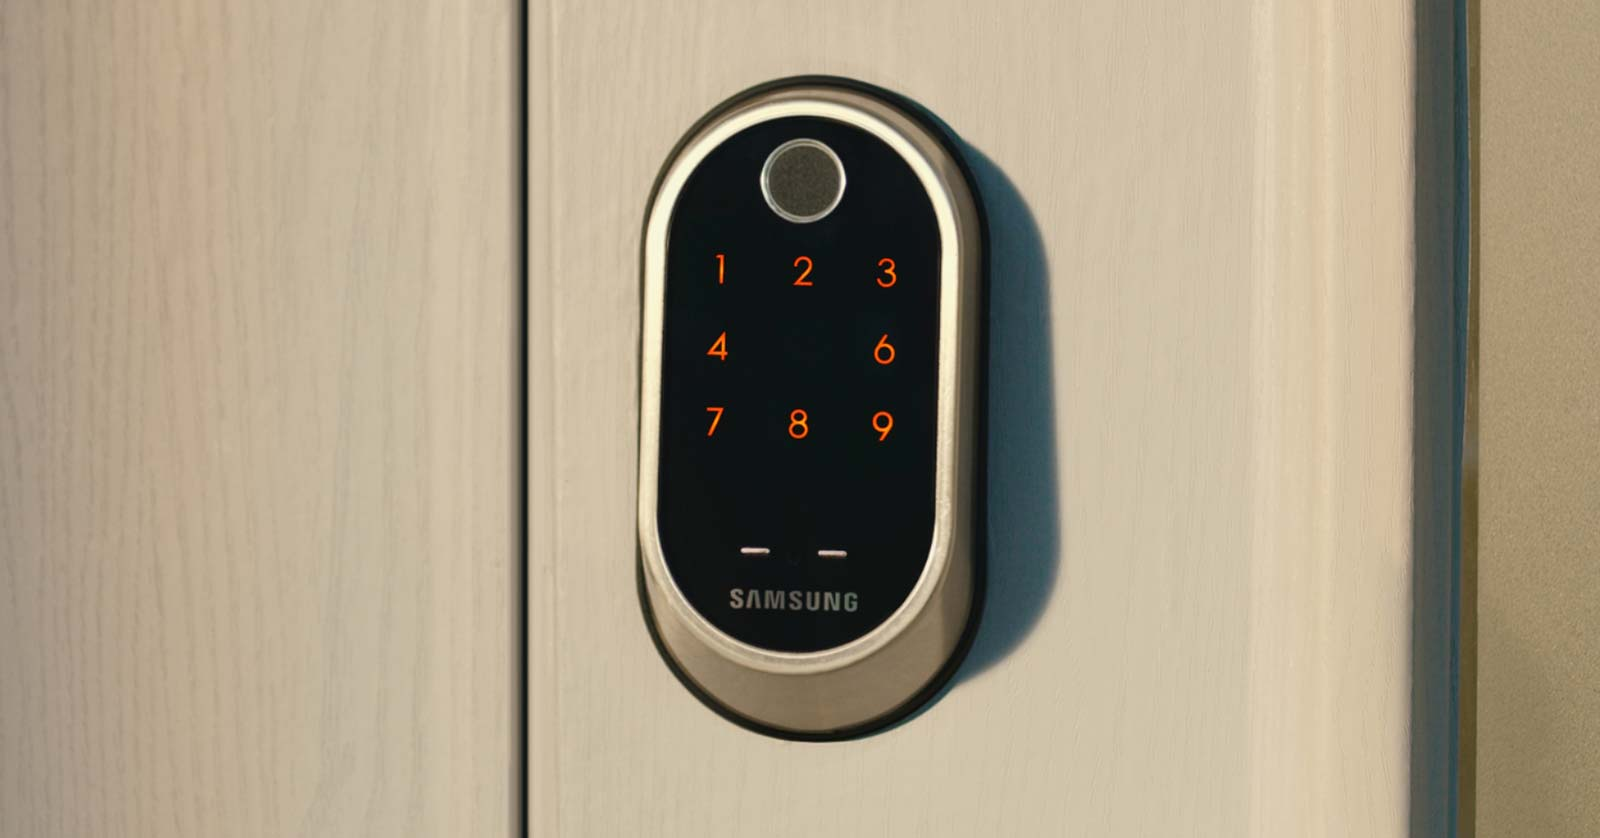 Samsung A30 smart lock